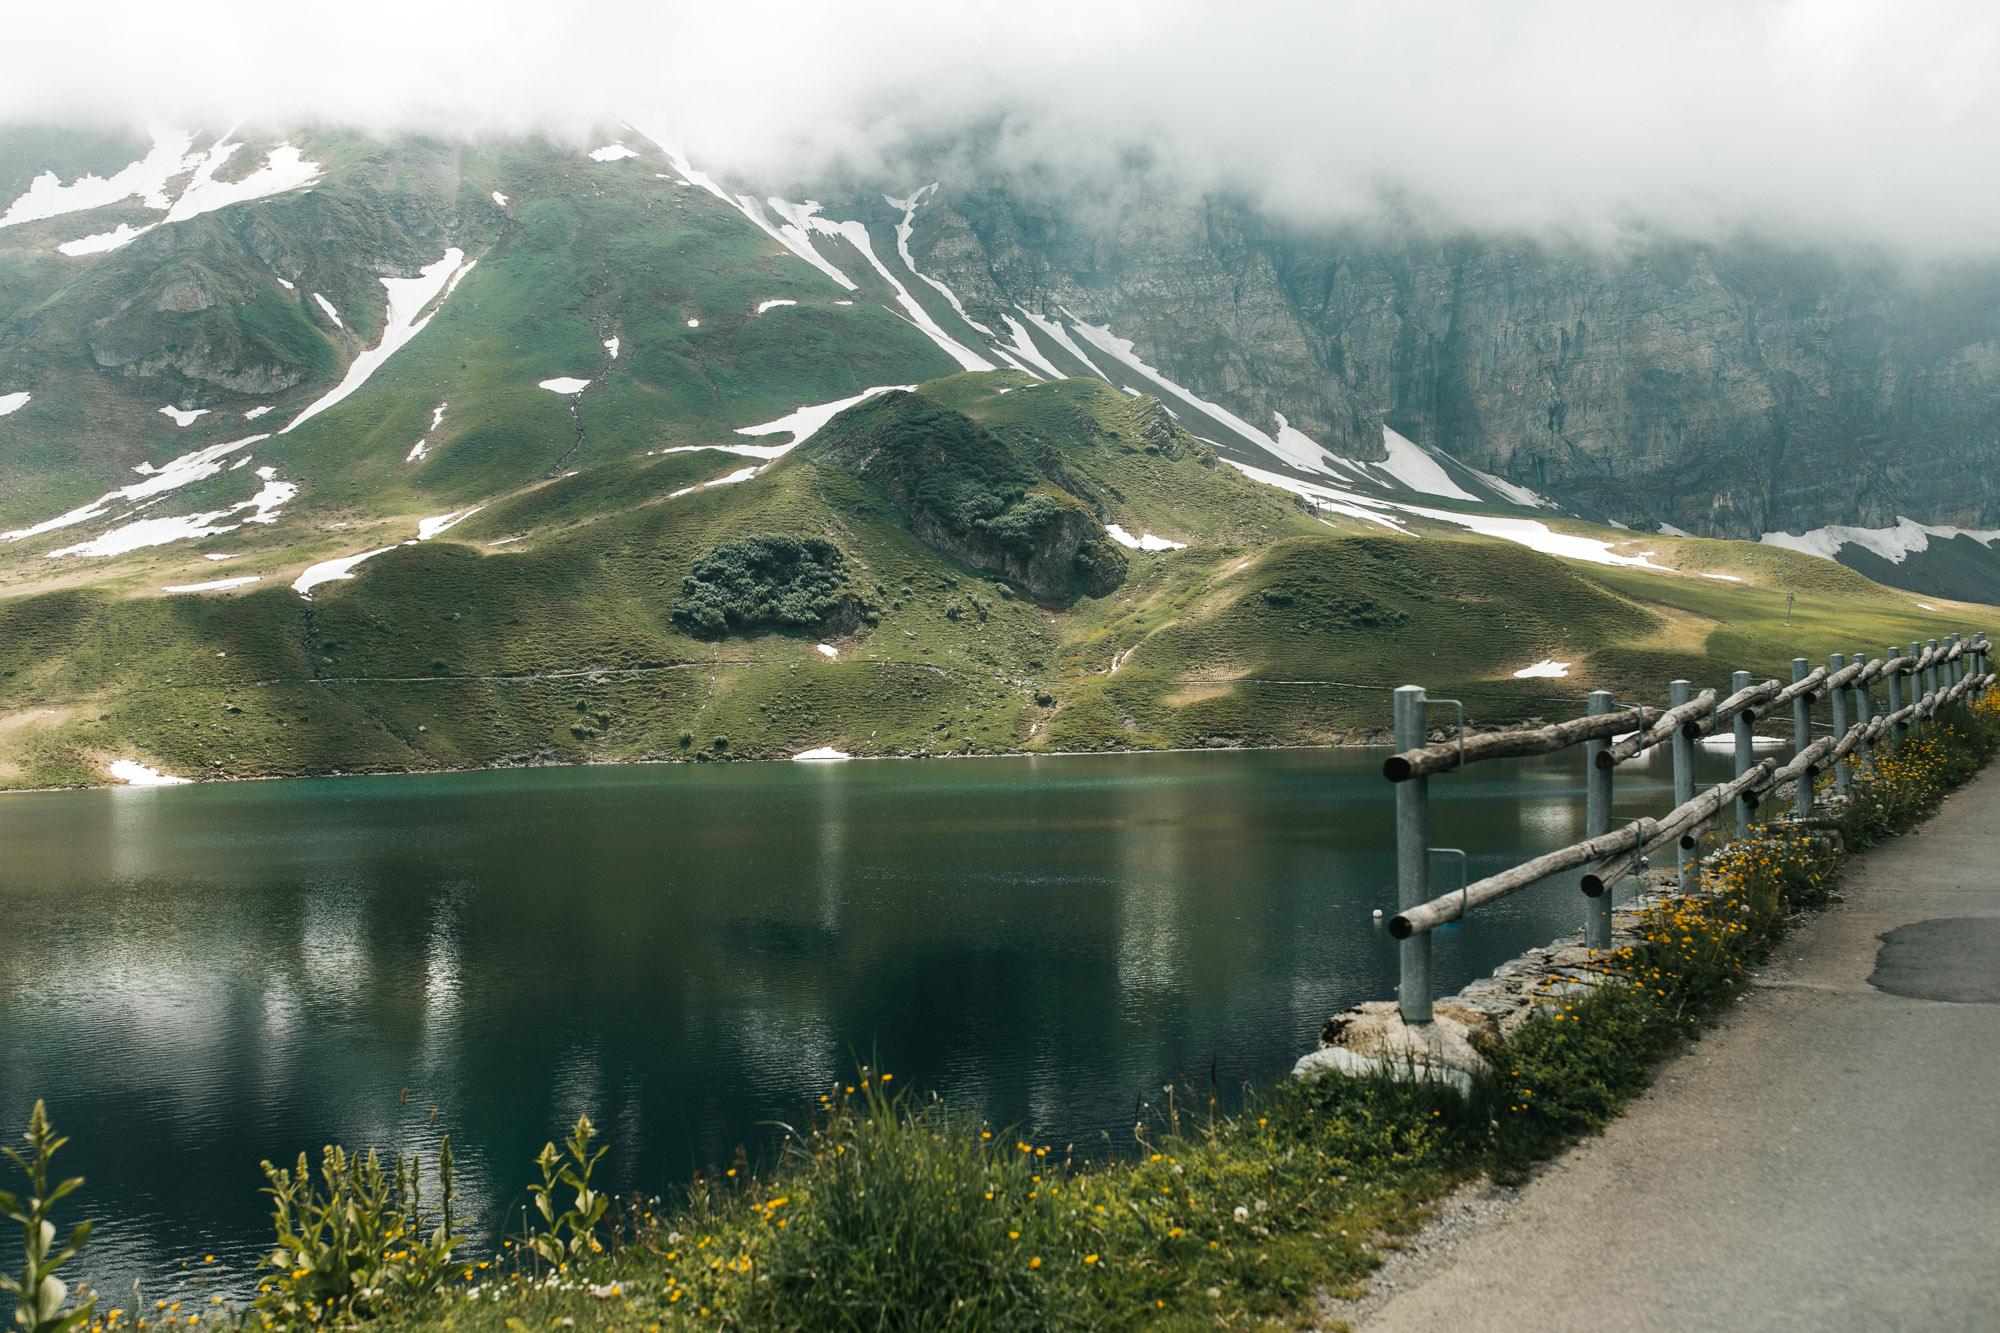 SwitzerlandBlog_HBGOODIE2018 (34 of 58).jpg